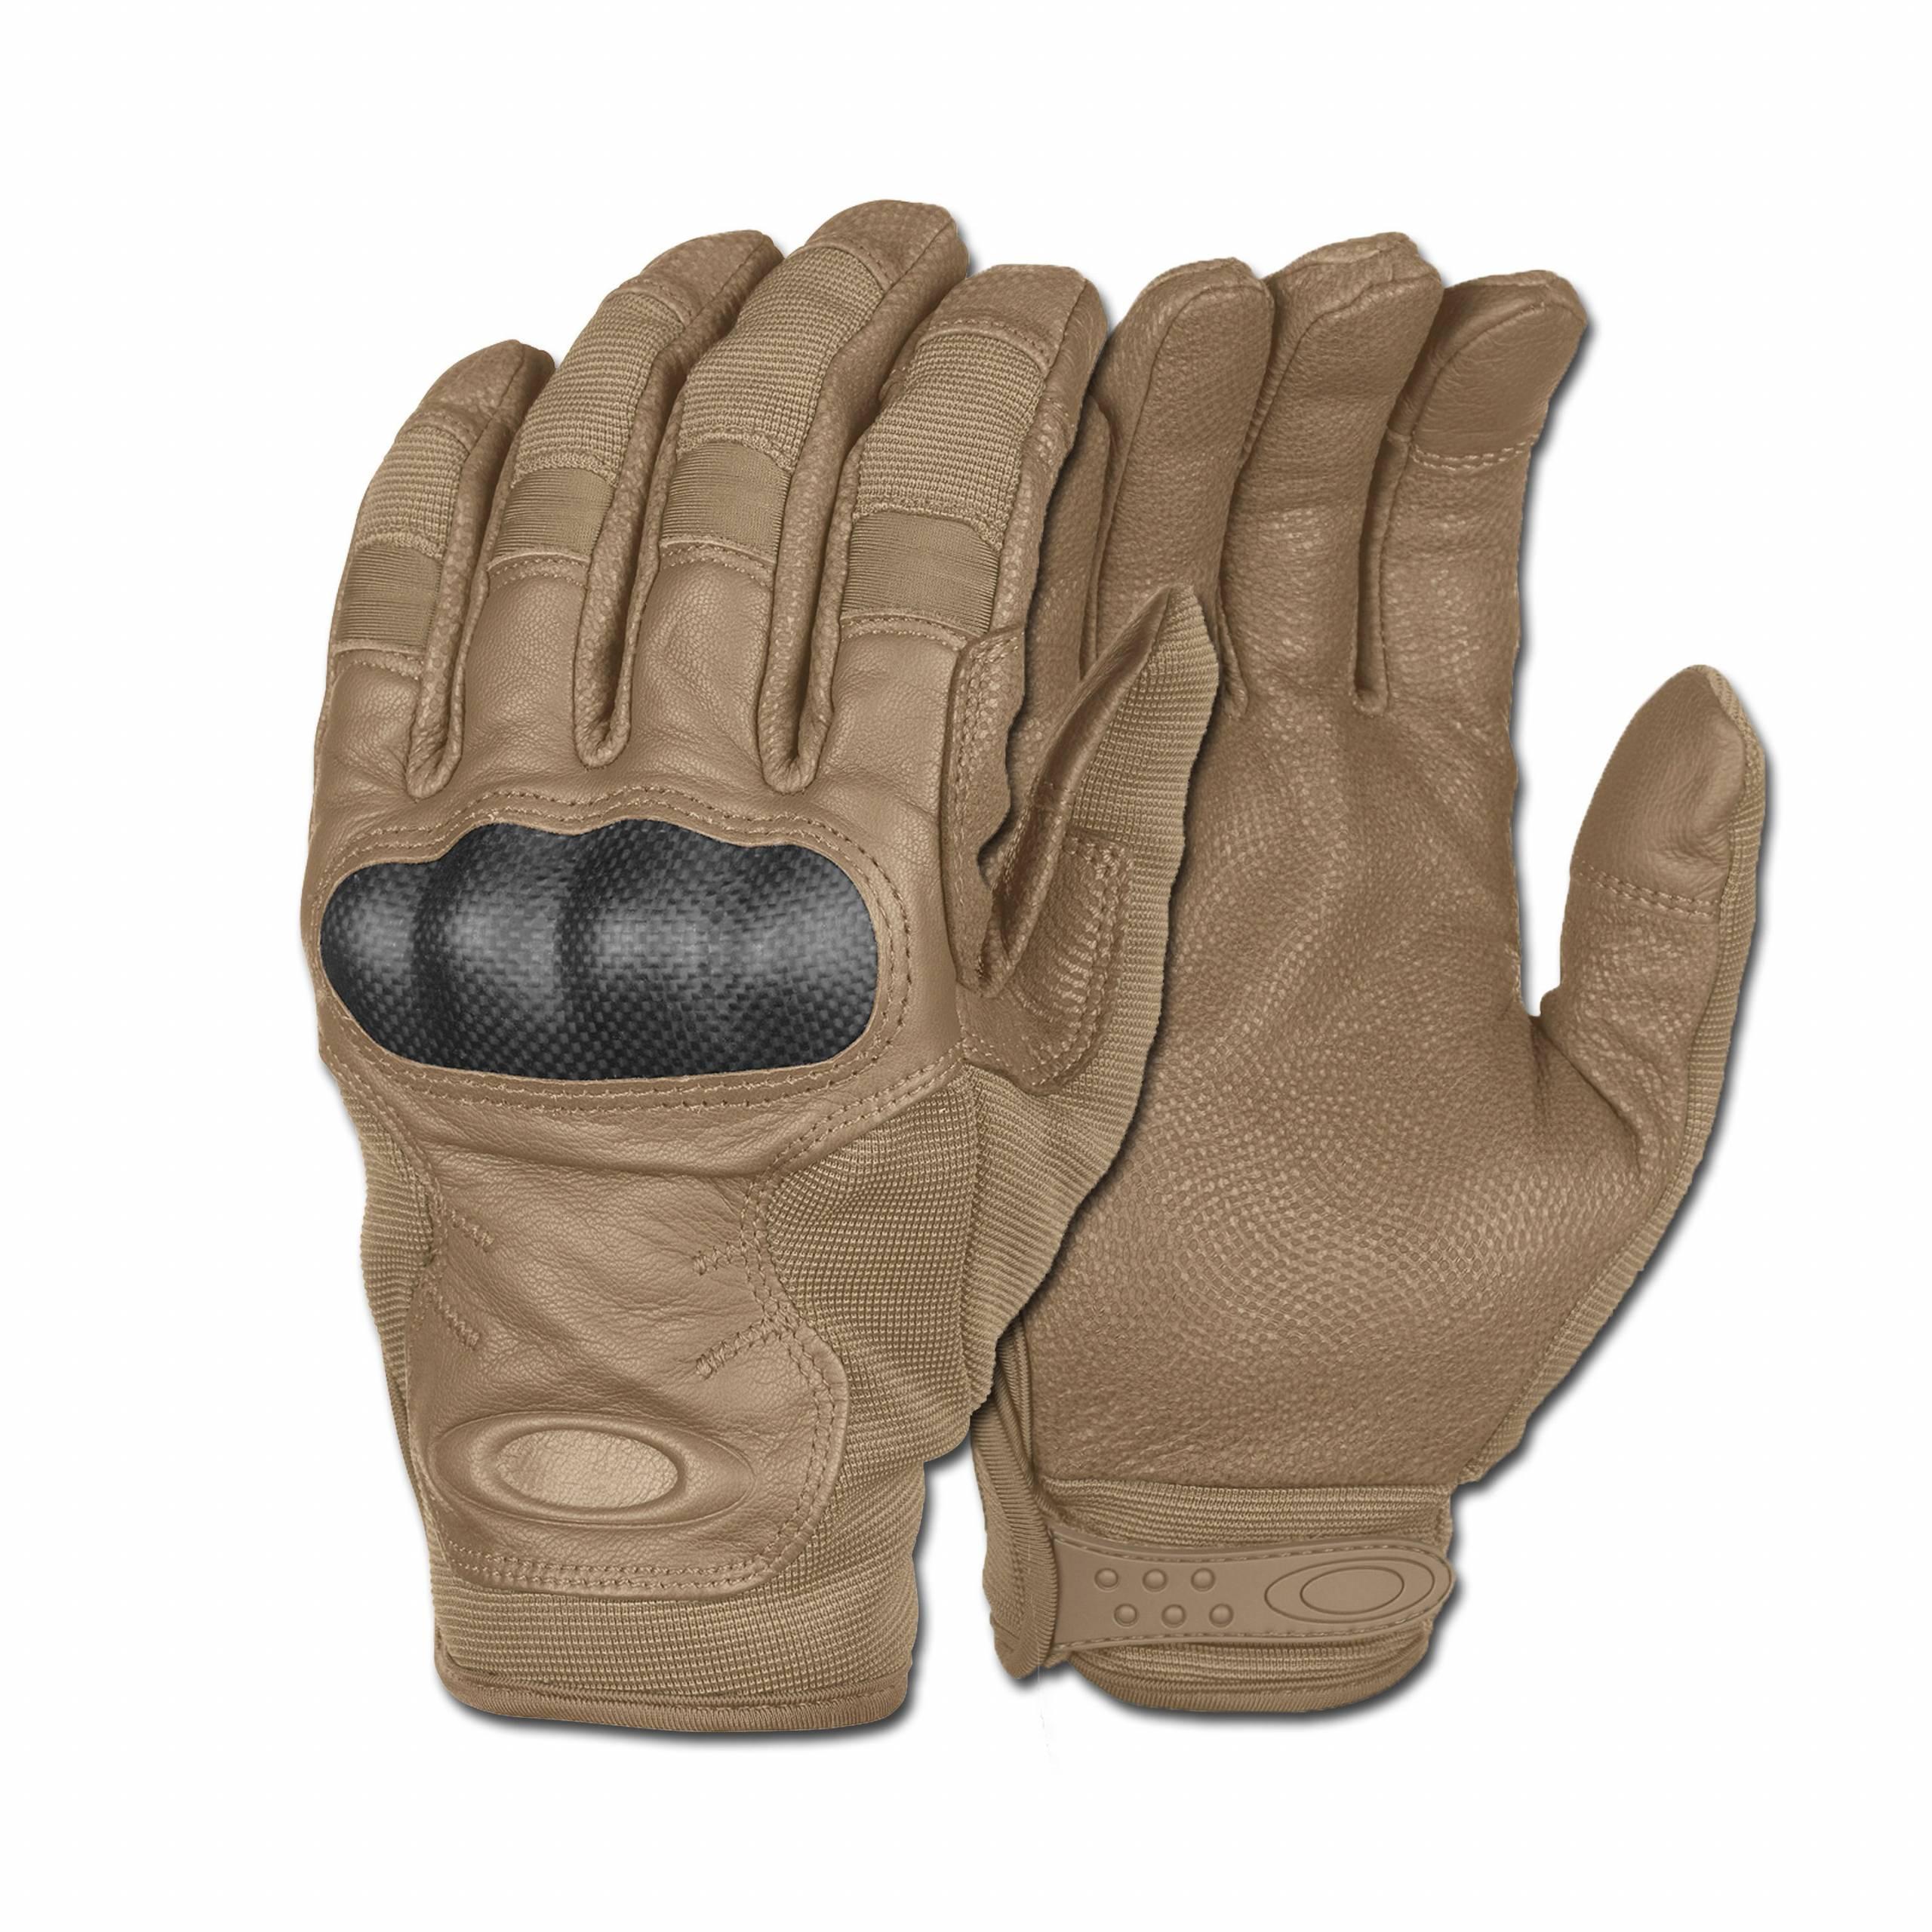 Handschuhe Oakley SI Tactical Touch coyote kaufen bei ASMC 88743b118221